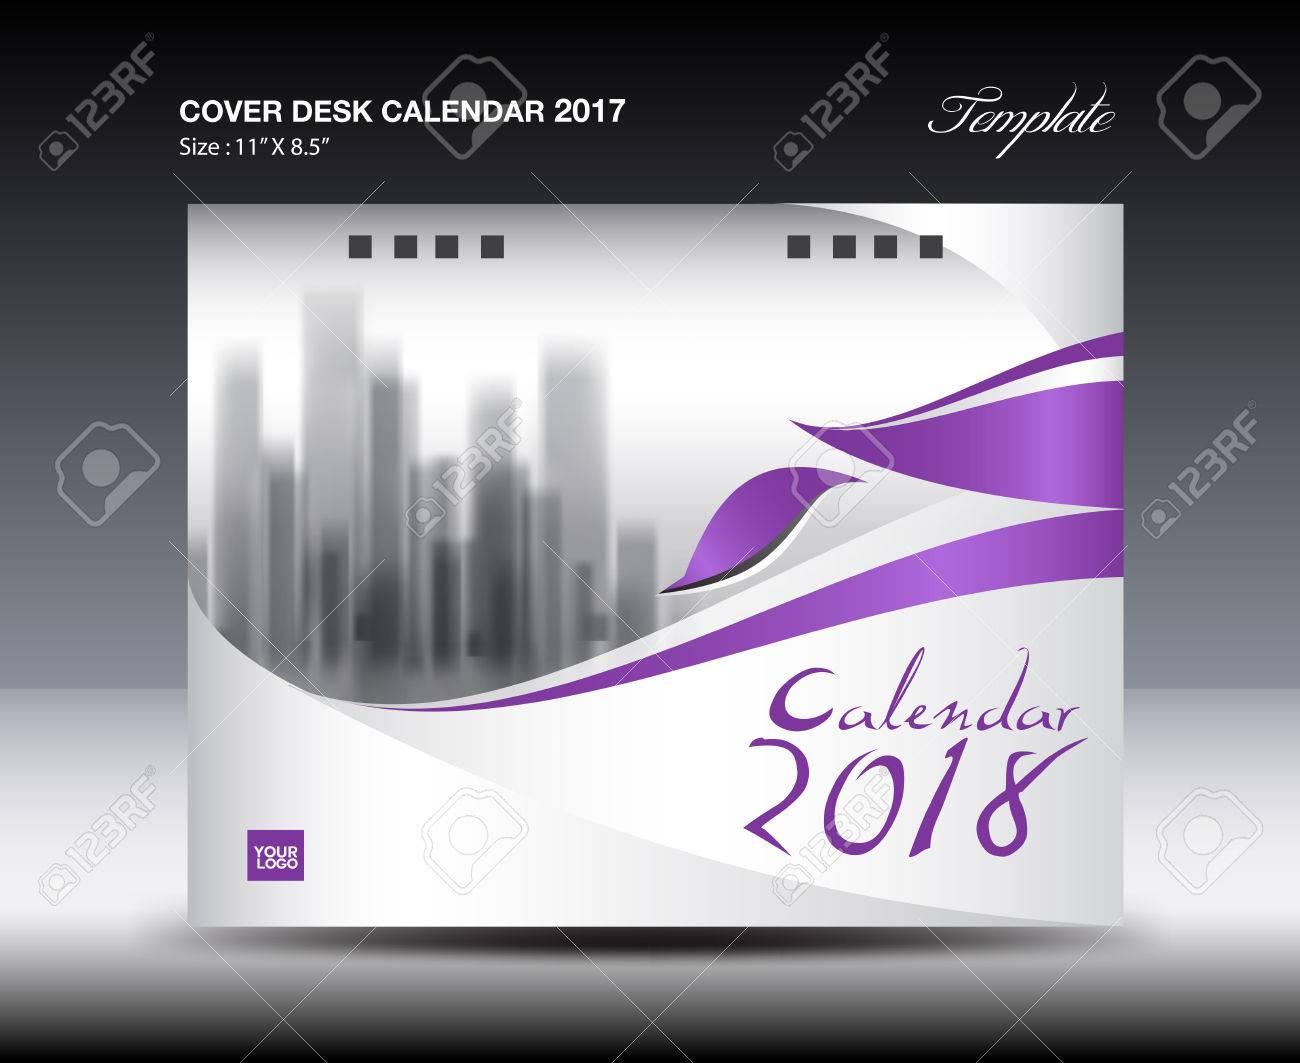 Calendar Flyer Template   Purple Cover Desk Calendar 2018 Design Flyer Template Advertising